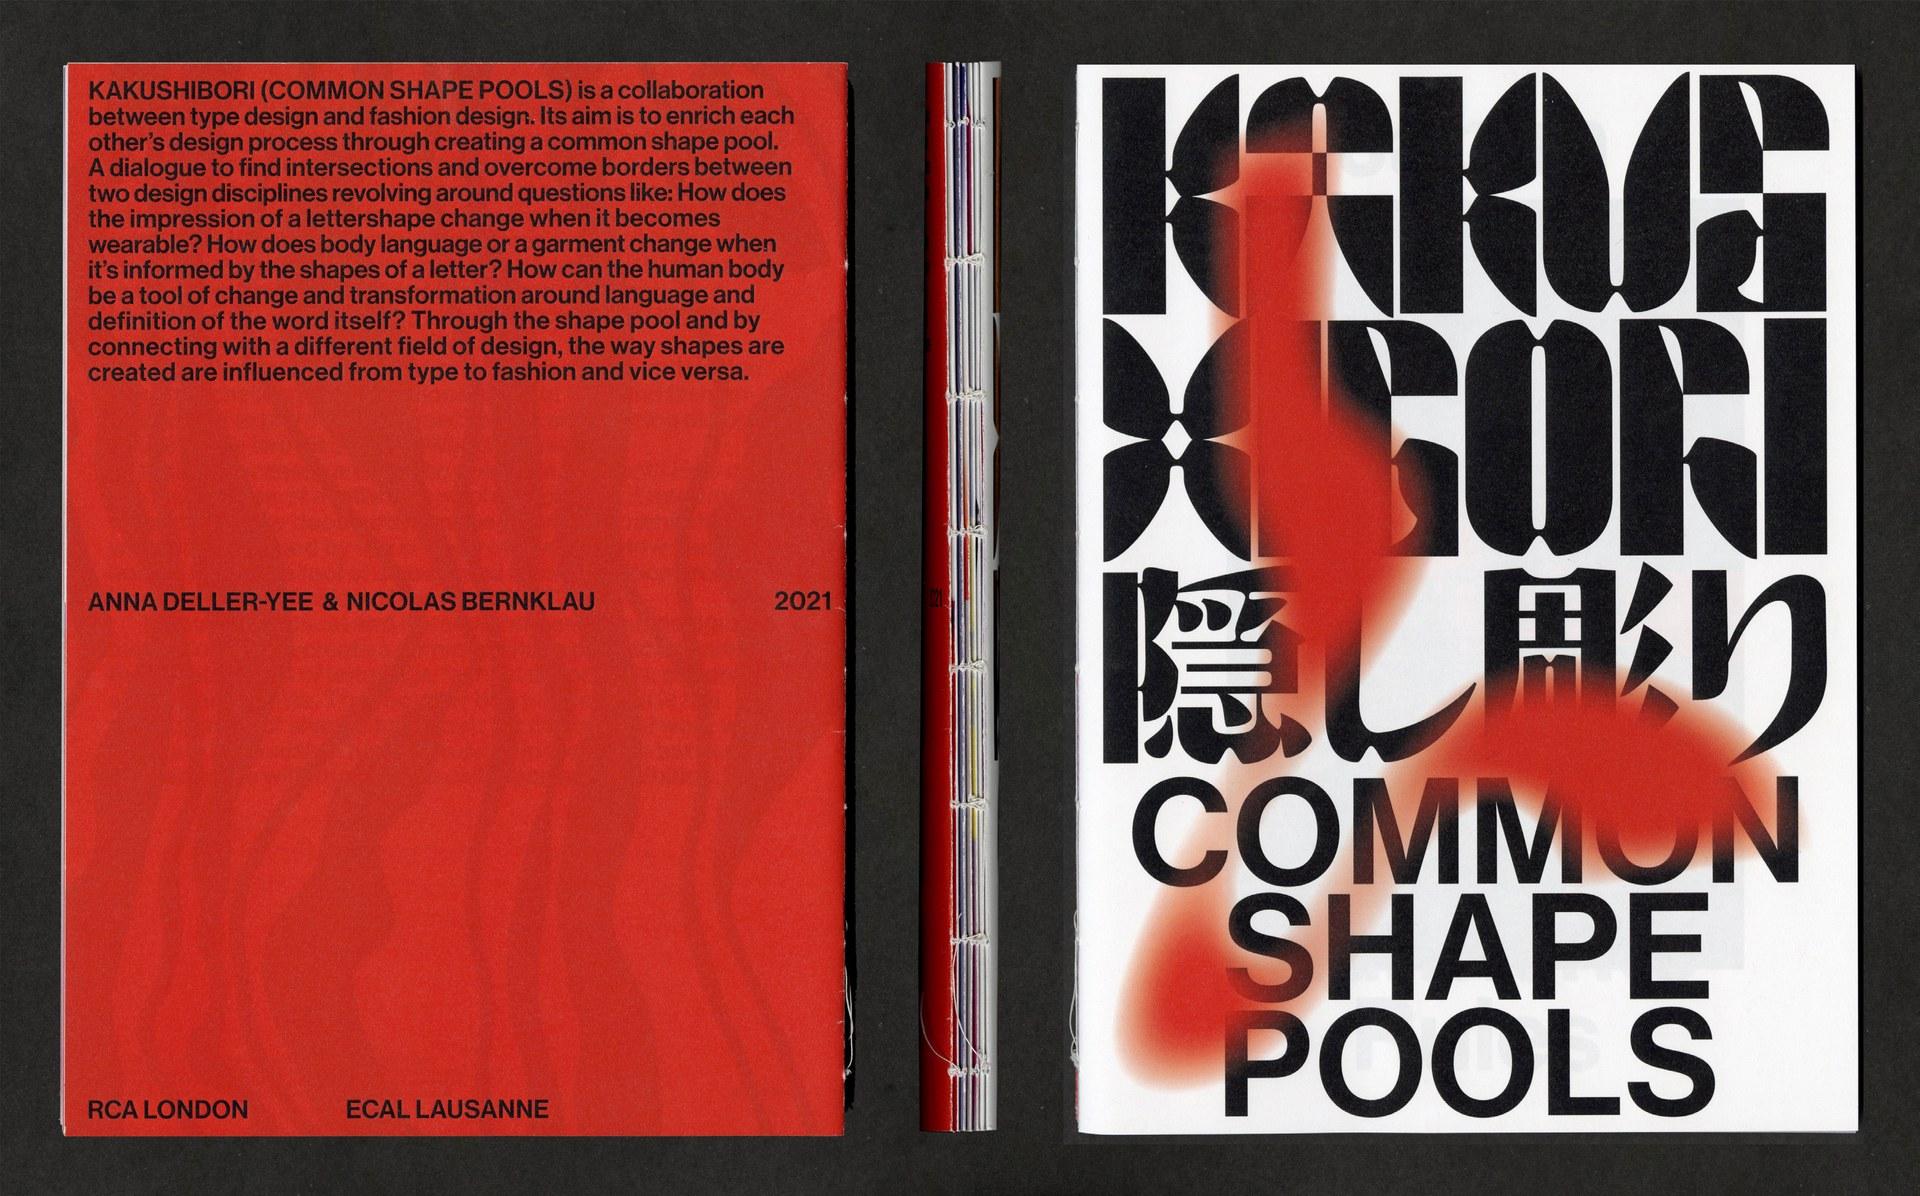 [Common Shape Pools with Nicolas Bernklau, ECAL Lausanne]